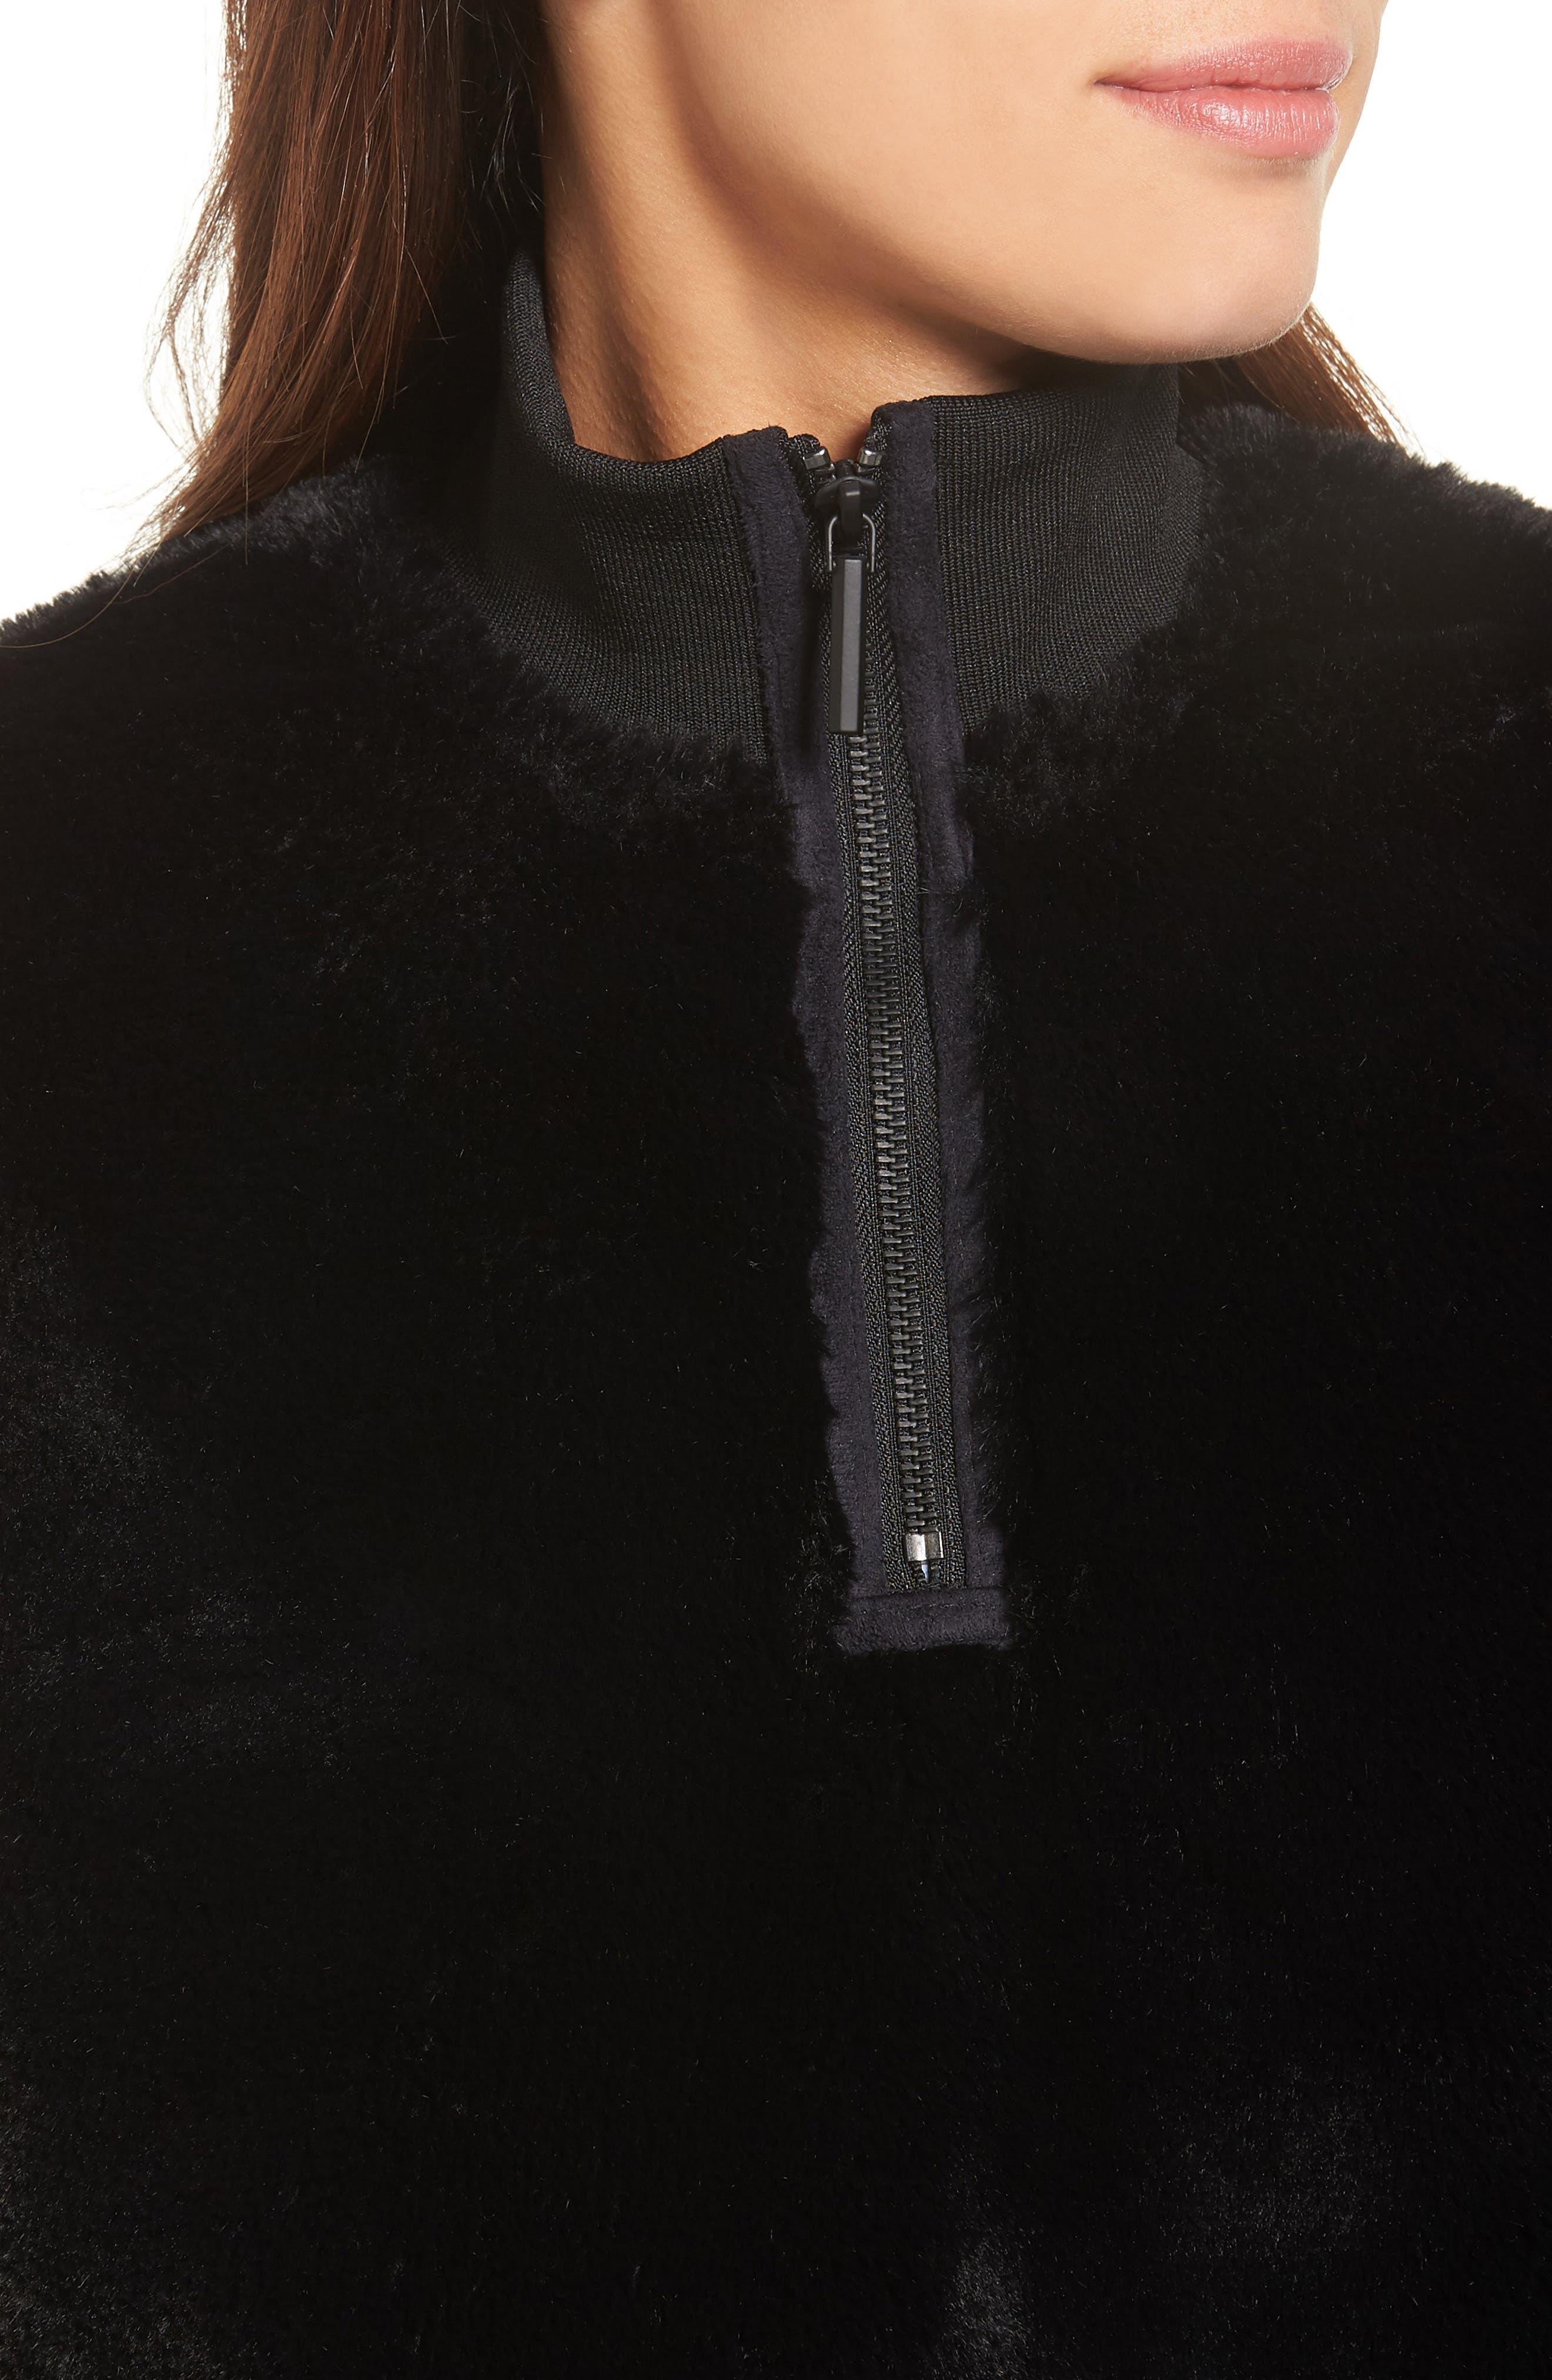 Half-Zip Faux Fur Sweatshirt,                             Alternate thumbnail 4, color,                             Black